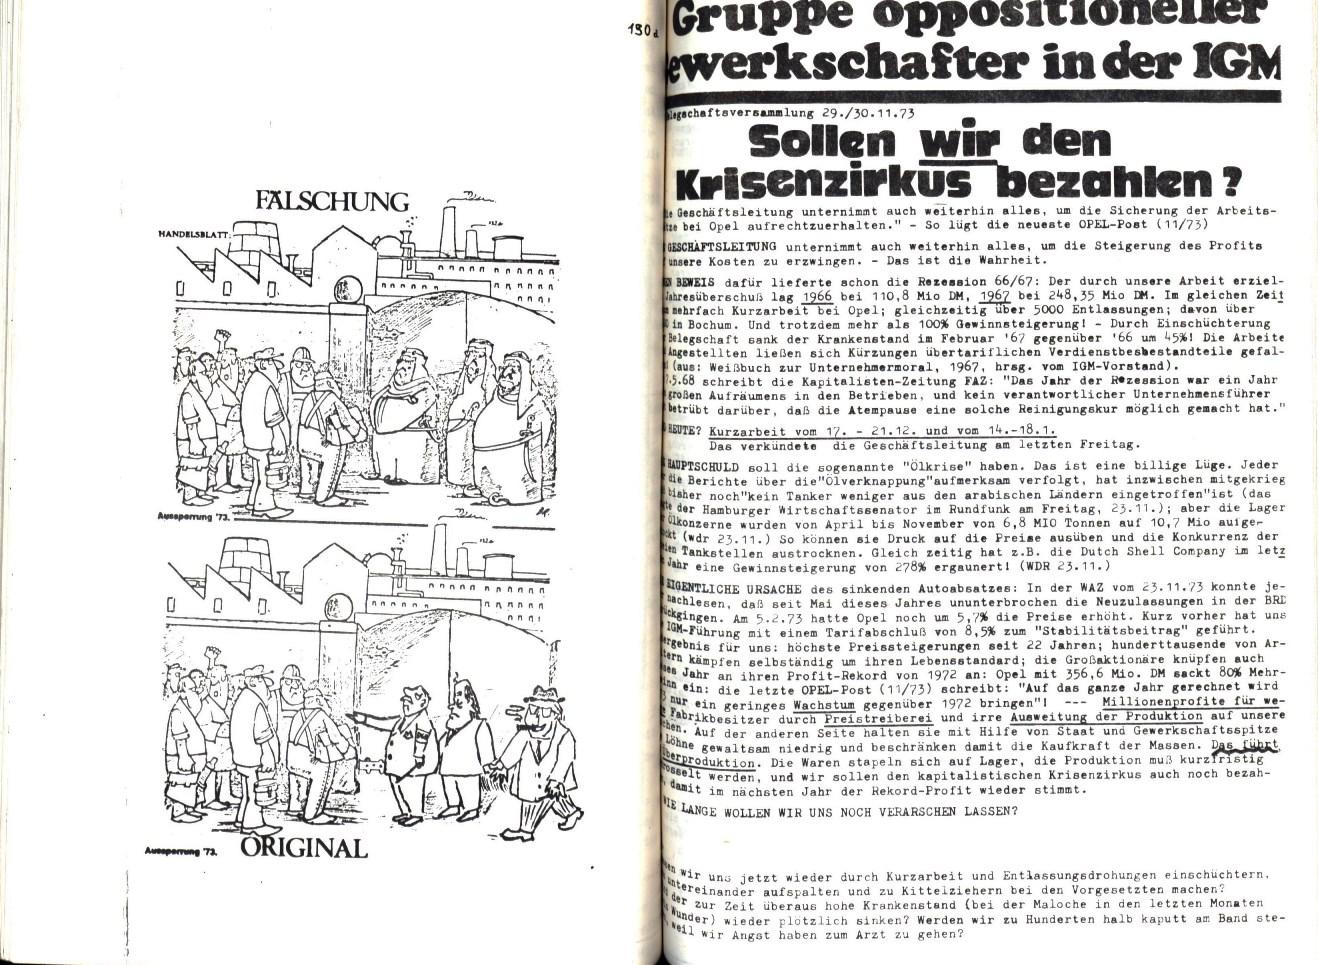 Bochum_IGM_Opel_PG_Opel_streikt_1973_068